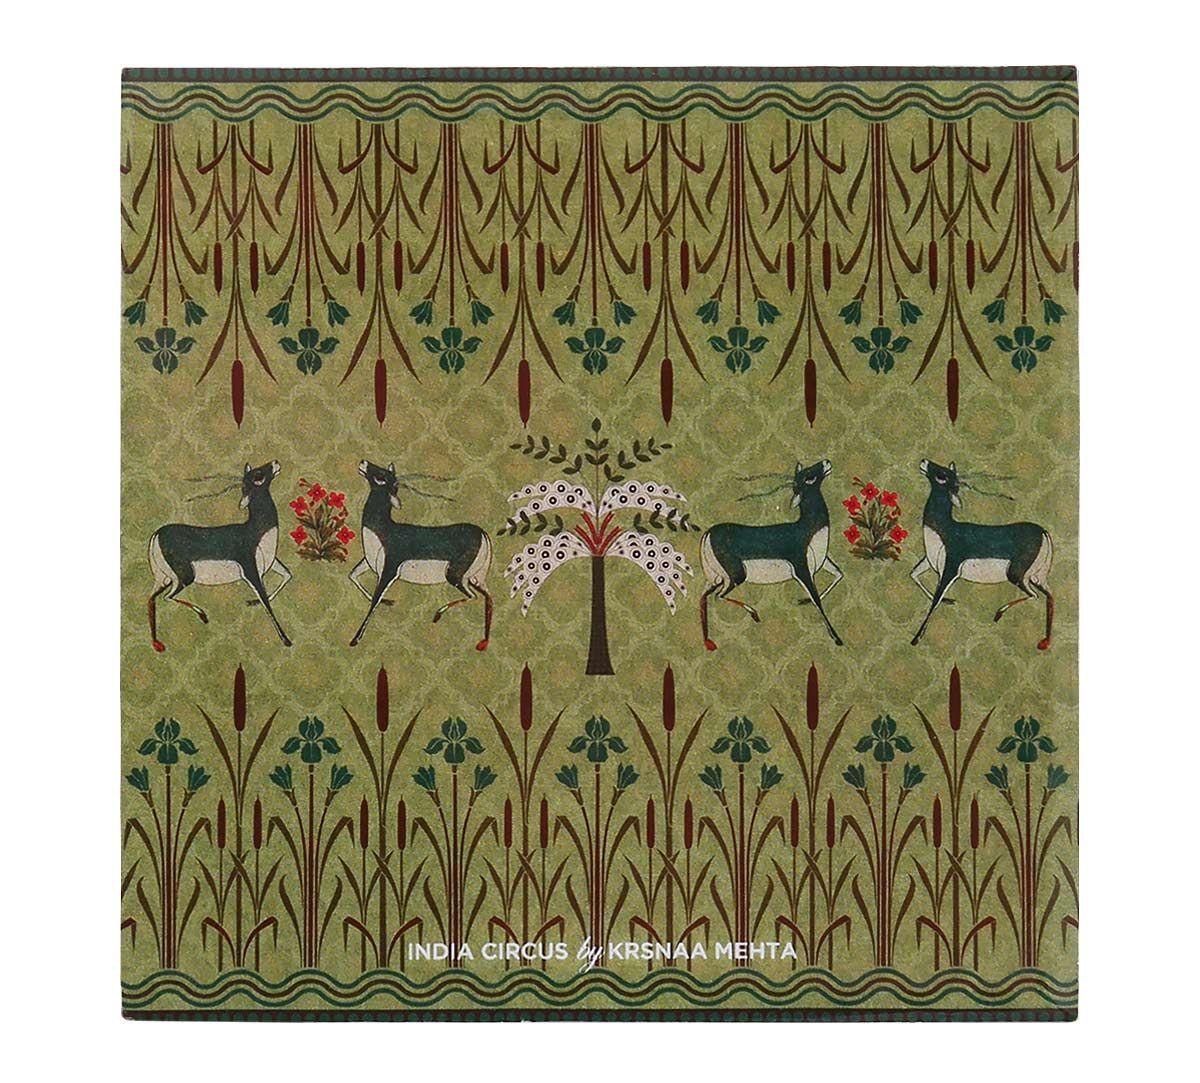 India Circus Mirroring Deer Garden MDF Table Coaster Set of 6